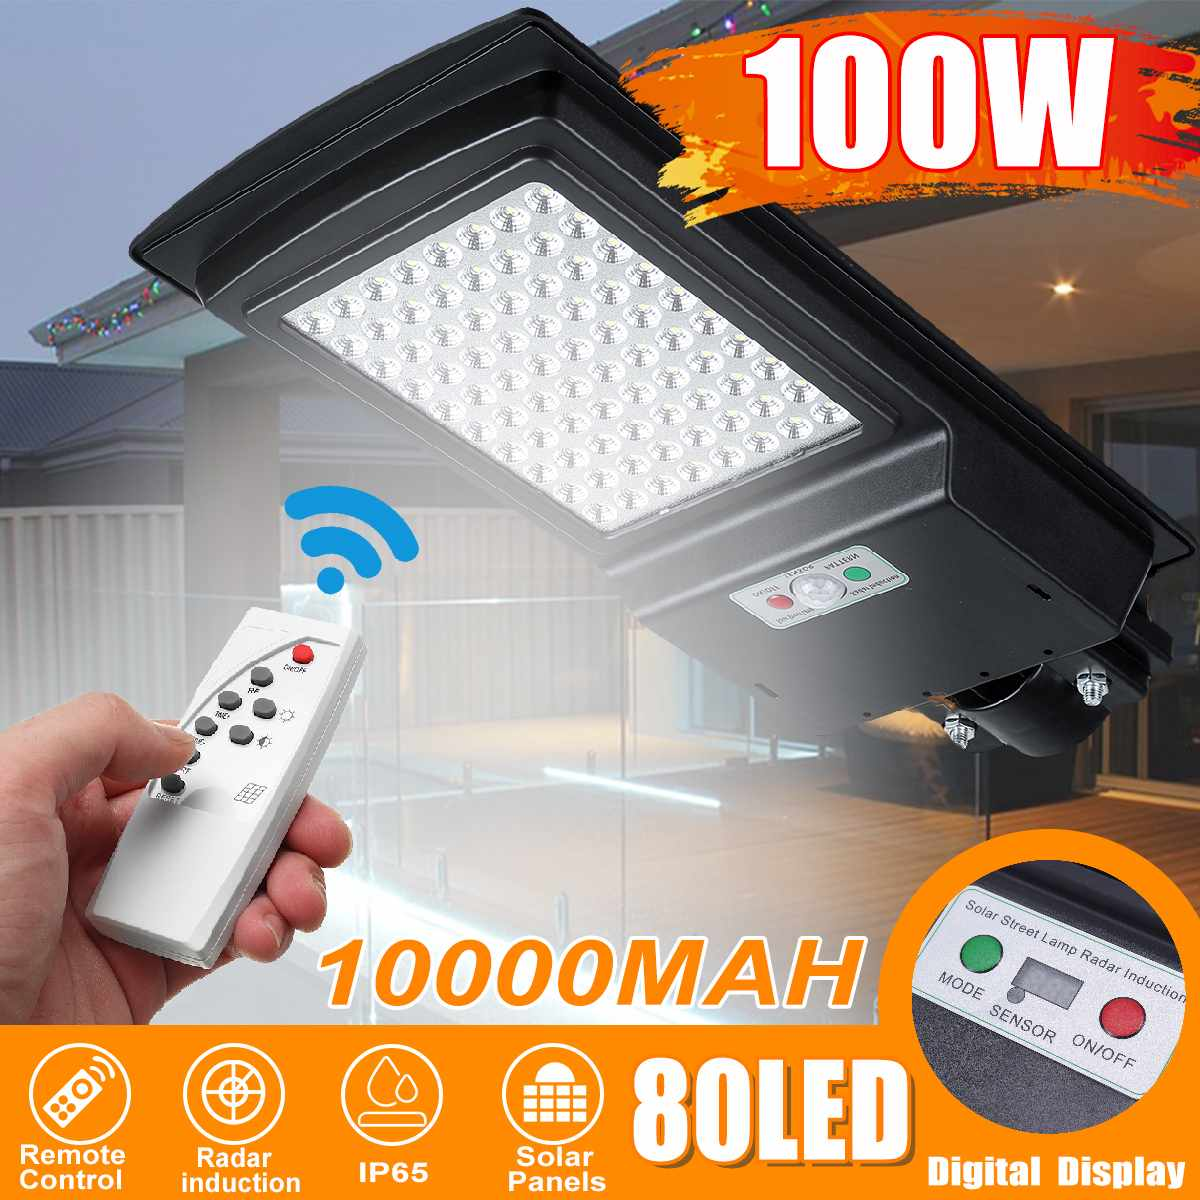 100W 80 LED Digital Wall Lamp IP65 Solar Street Light Radar Motion Constantly Bright & Induction Solar Sensor Remote Control|Street Lights| |  - title=